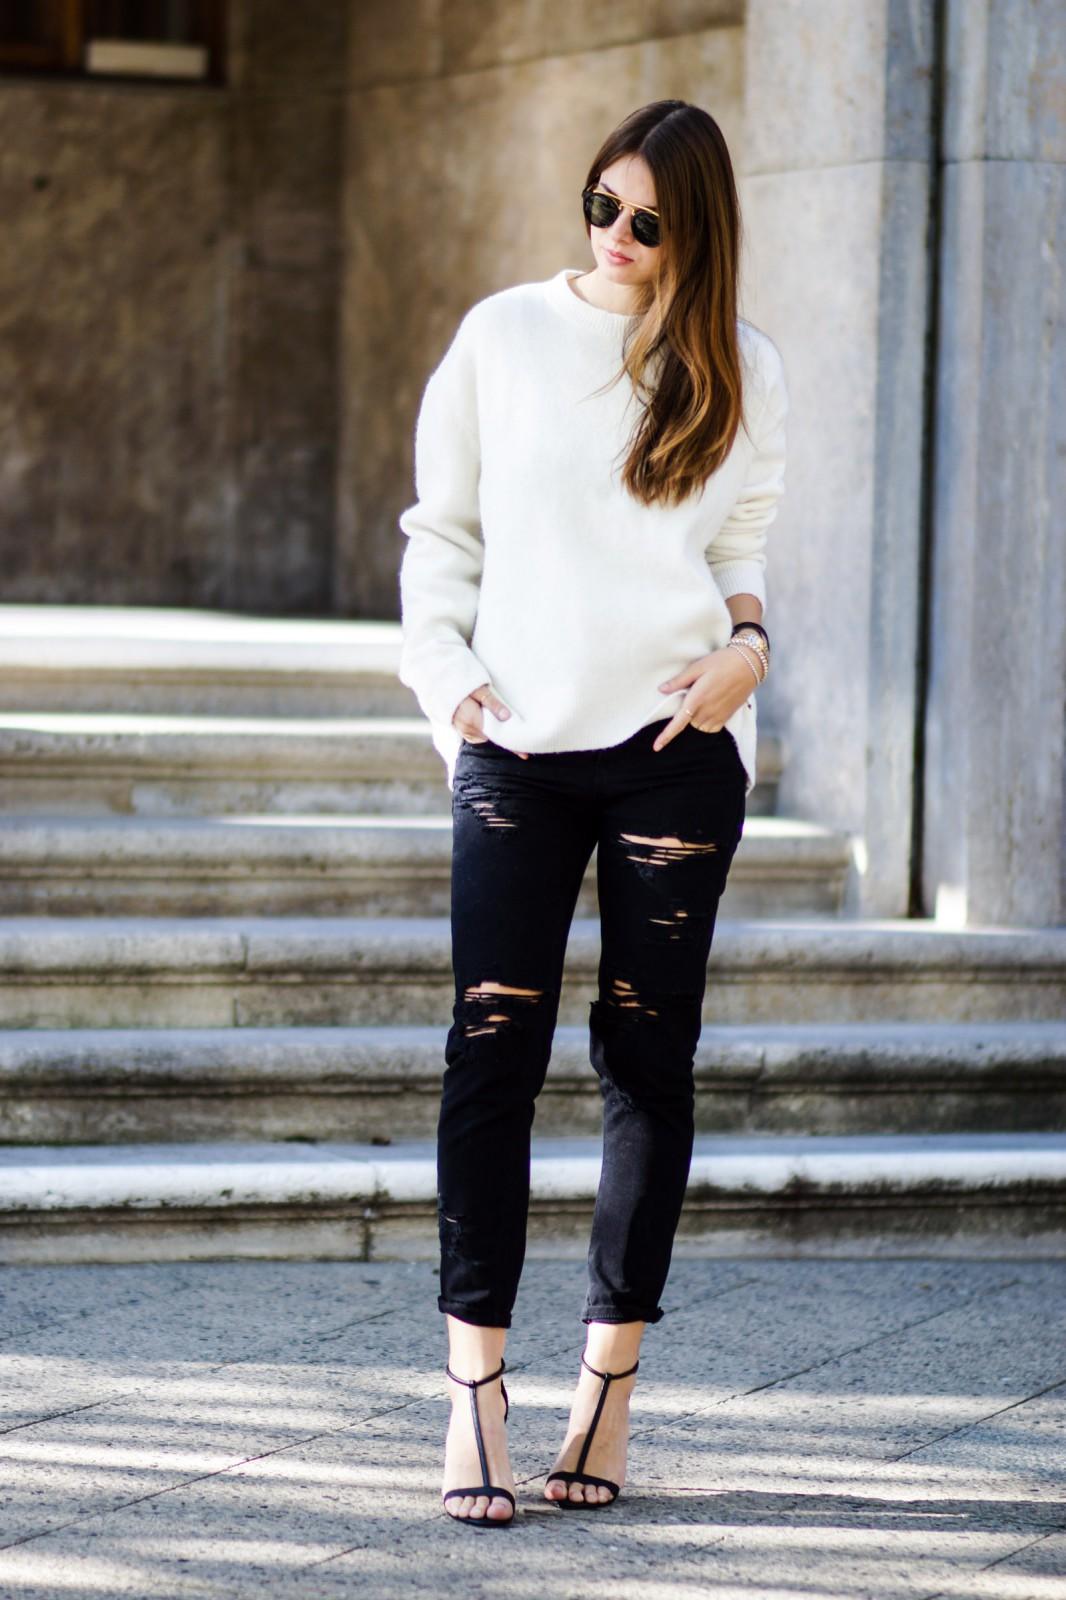 Oversized Sweater from Zara